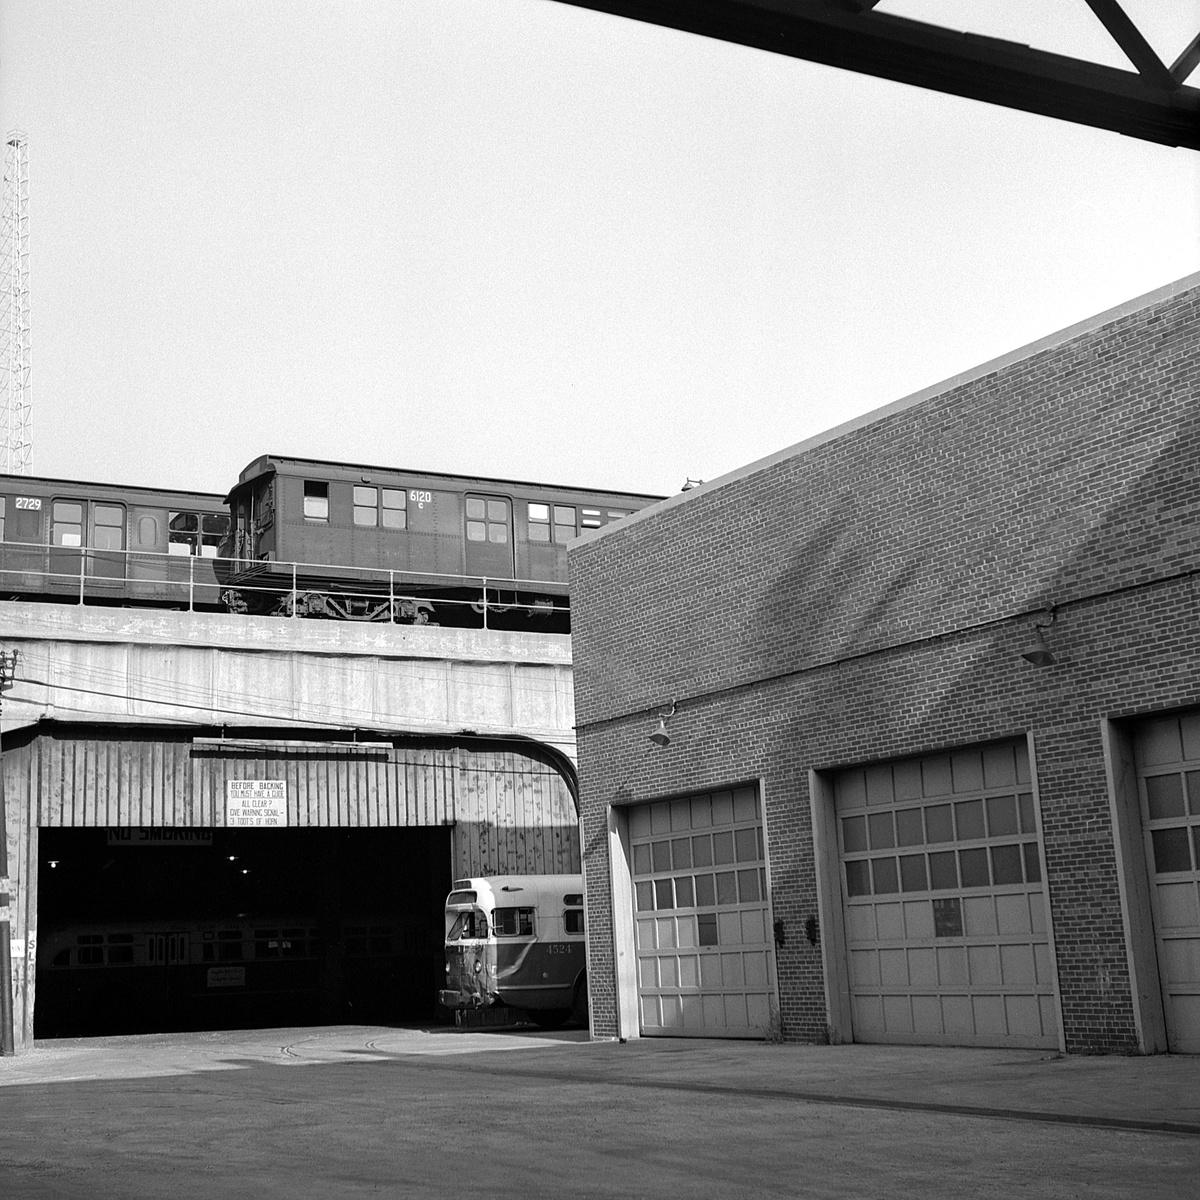 (576k, 1200x1200)<br><b>Country:</b> United States<br><b>City:</b> New York<br><b>System:</b> New York City Transit<br><b>Location:</b> East New York Yard/Shops<br><b>Car:</b> BMT D-Type Triplex 6120 <br><b>Collection of:</b> David Pirmann<br><b>Date:</b> 10/19/1962<br><b>Viewed (this week/total):</b> 3 / 117